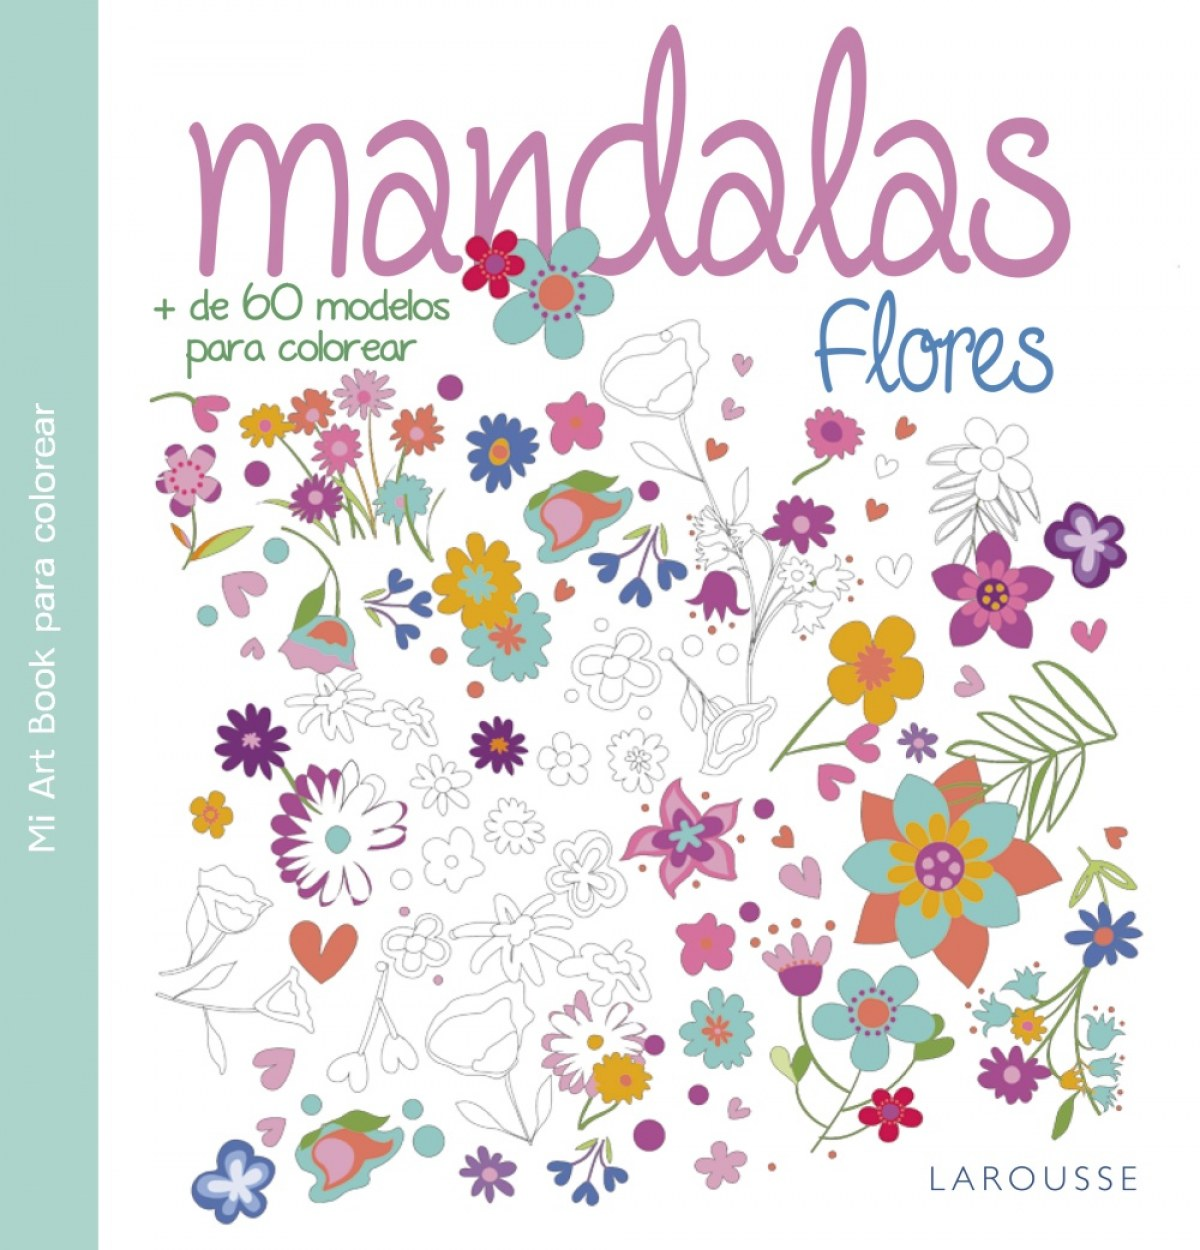 MANDALAS. FLORES 9788416368938